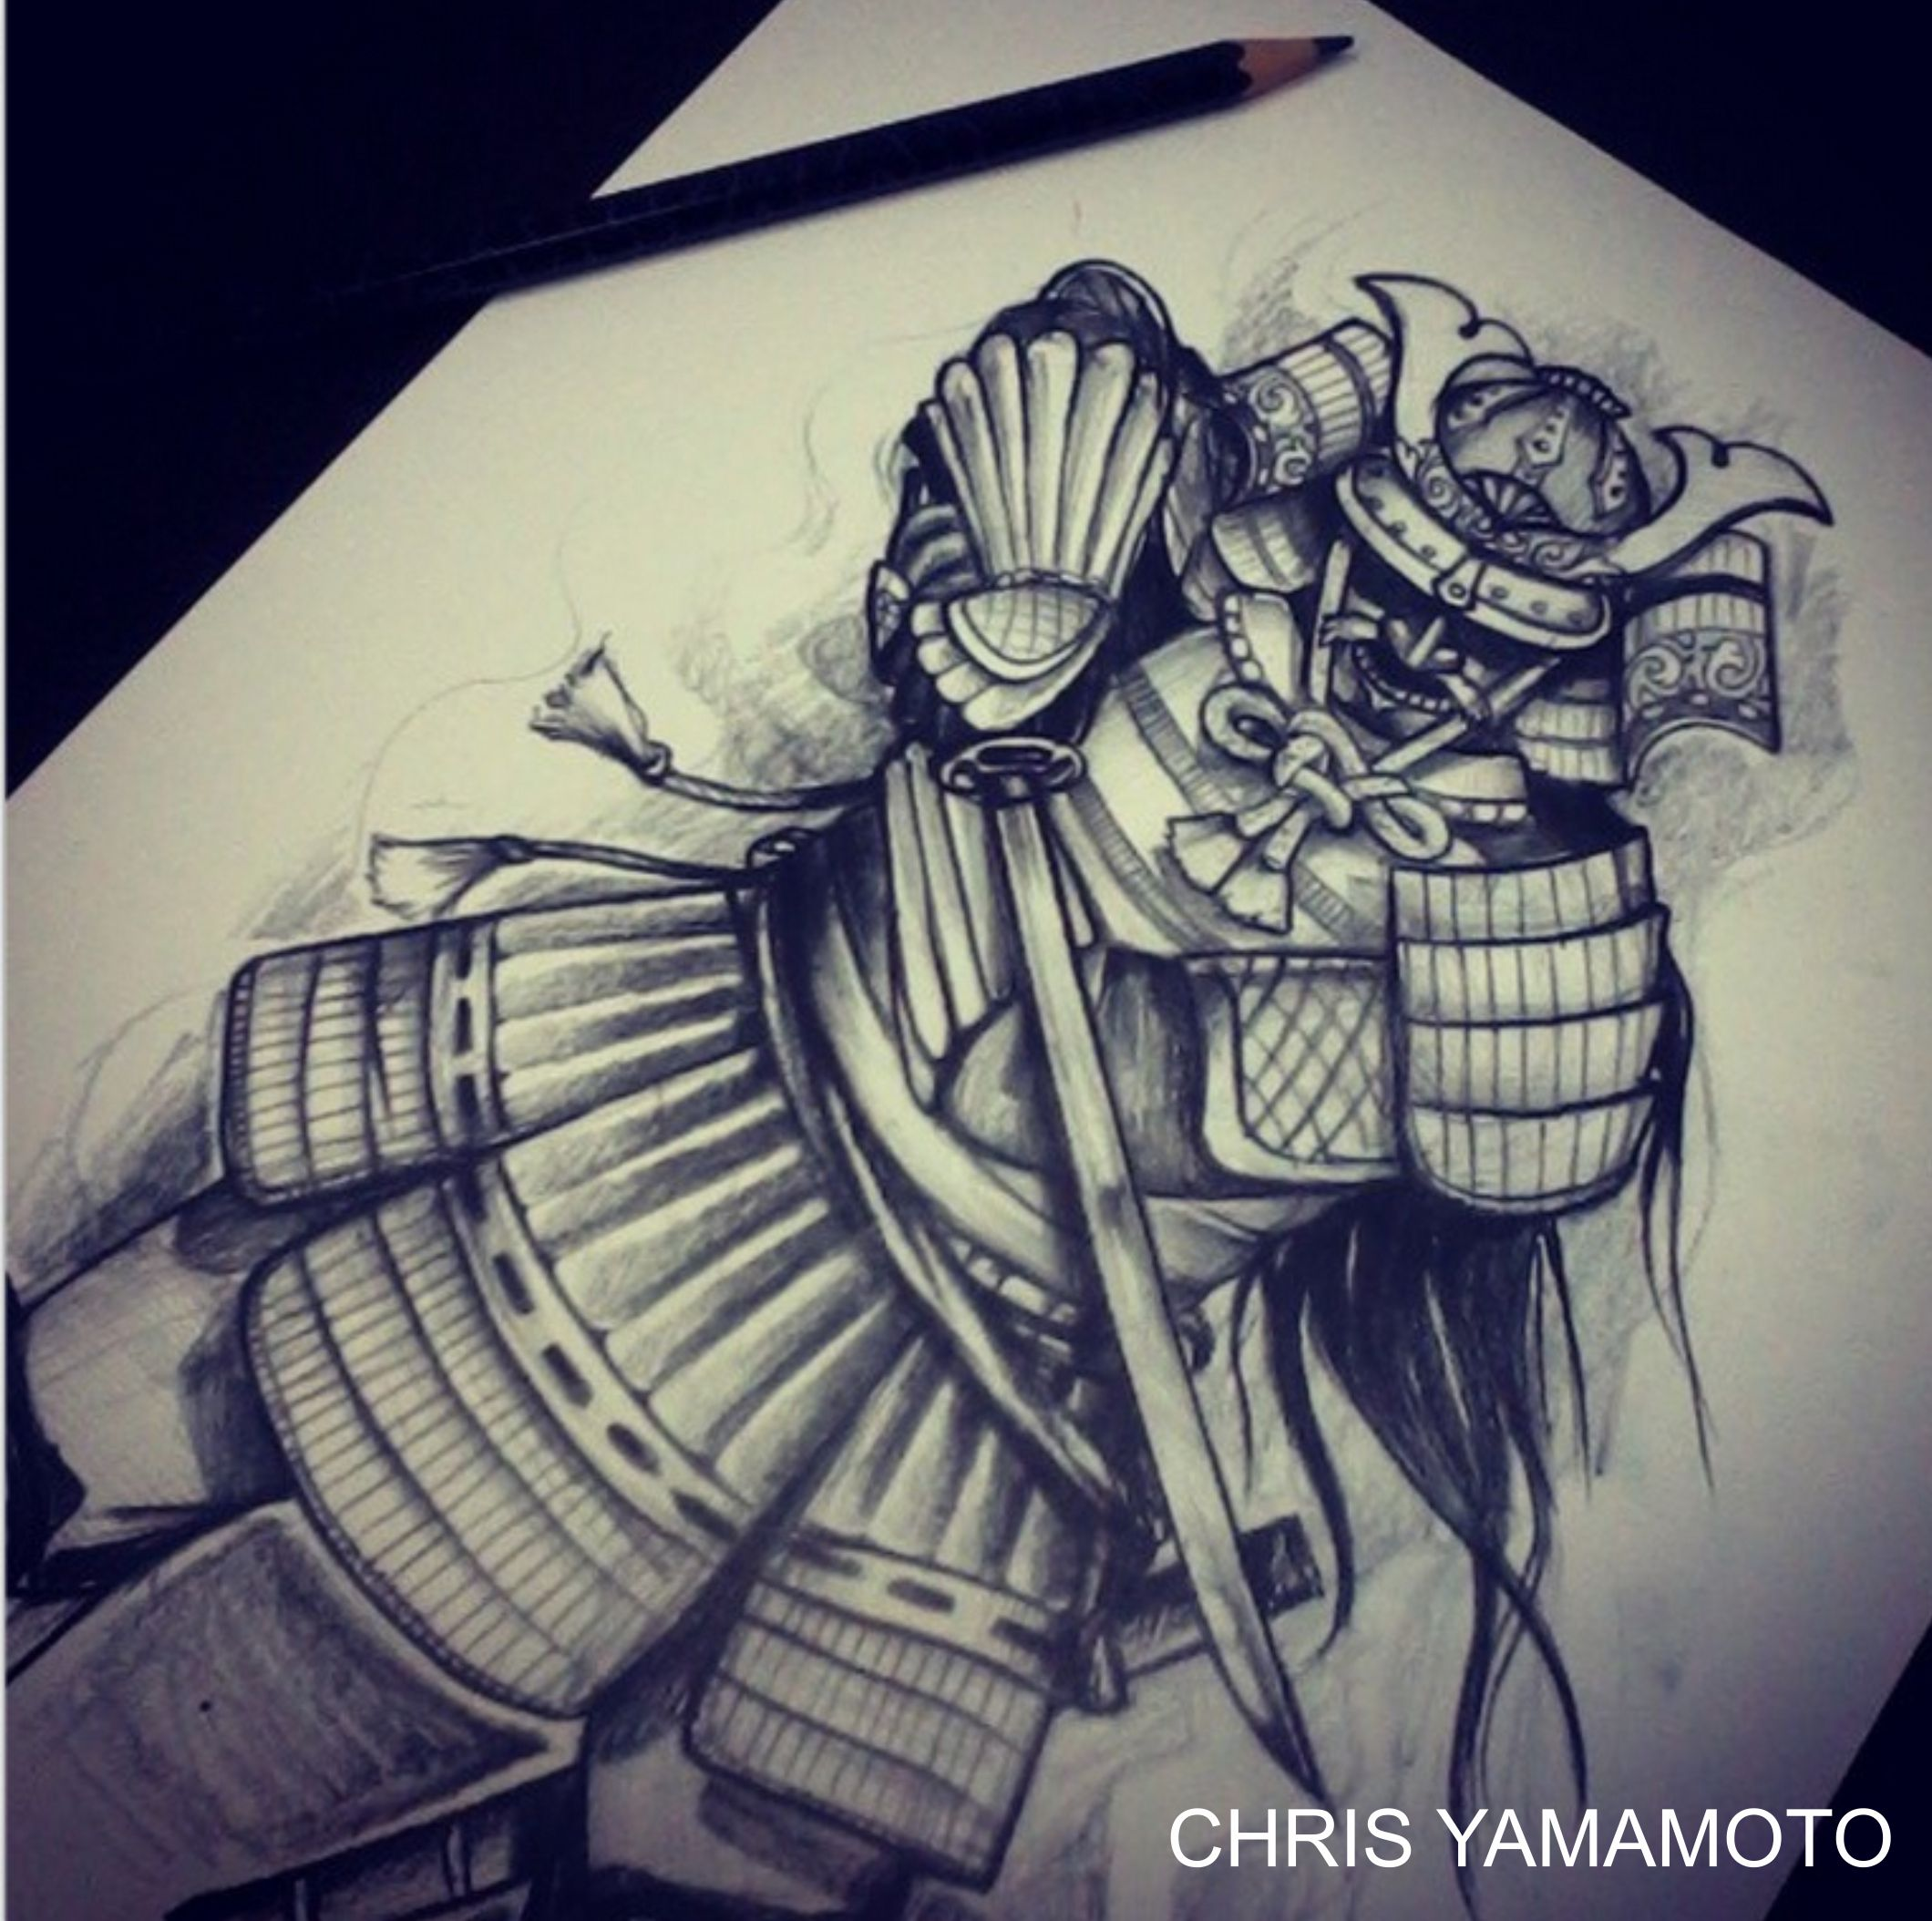 Drawn samurai sketch Tattoo by samurai Yamamoto by